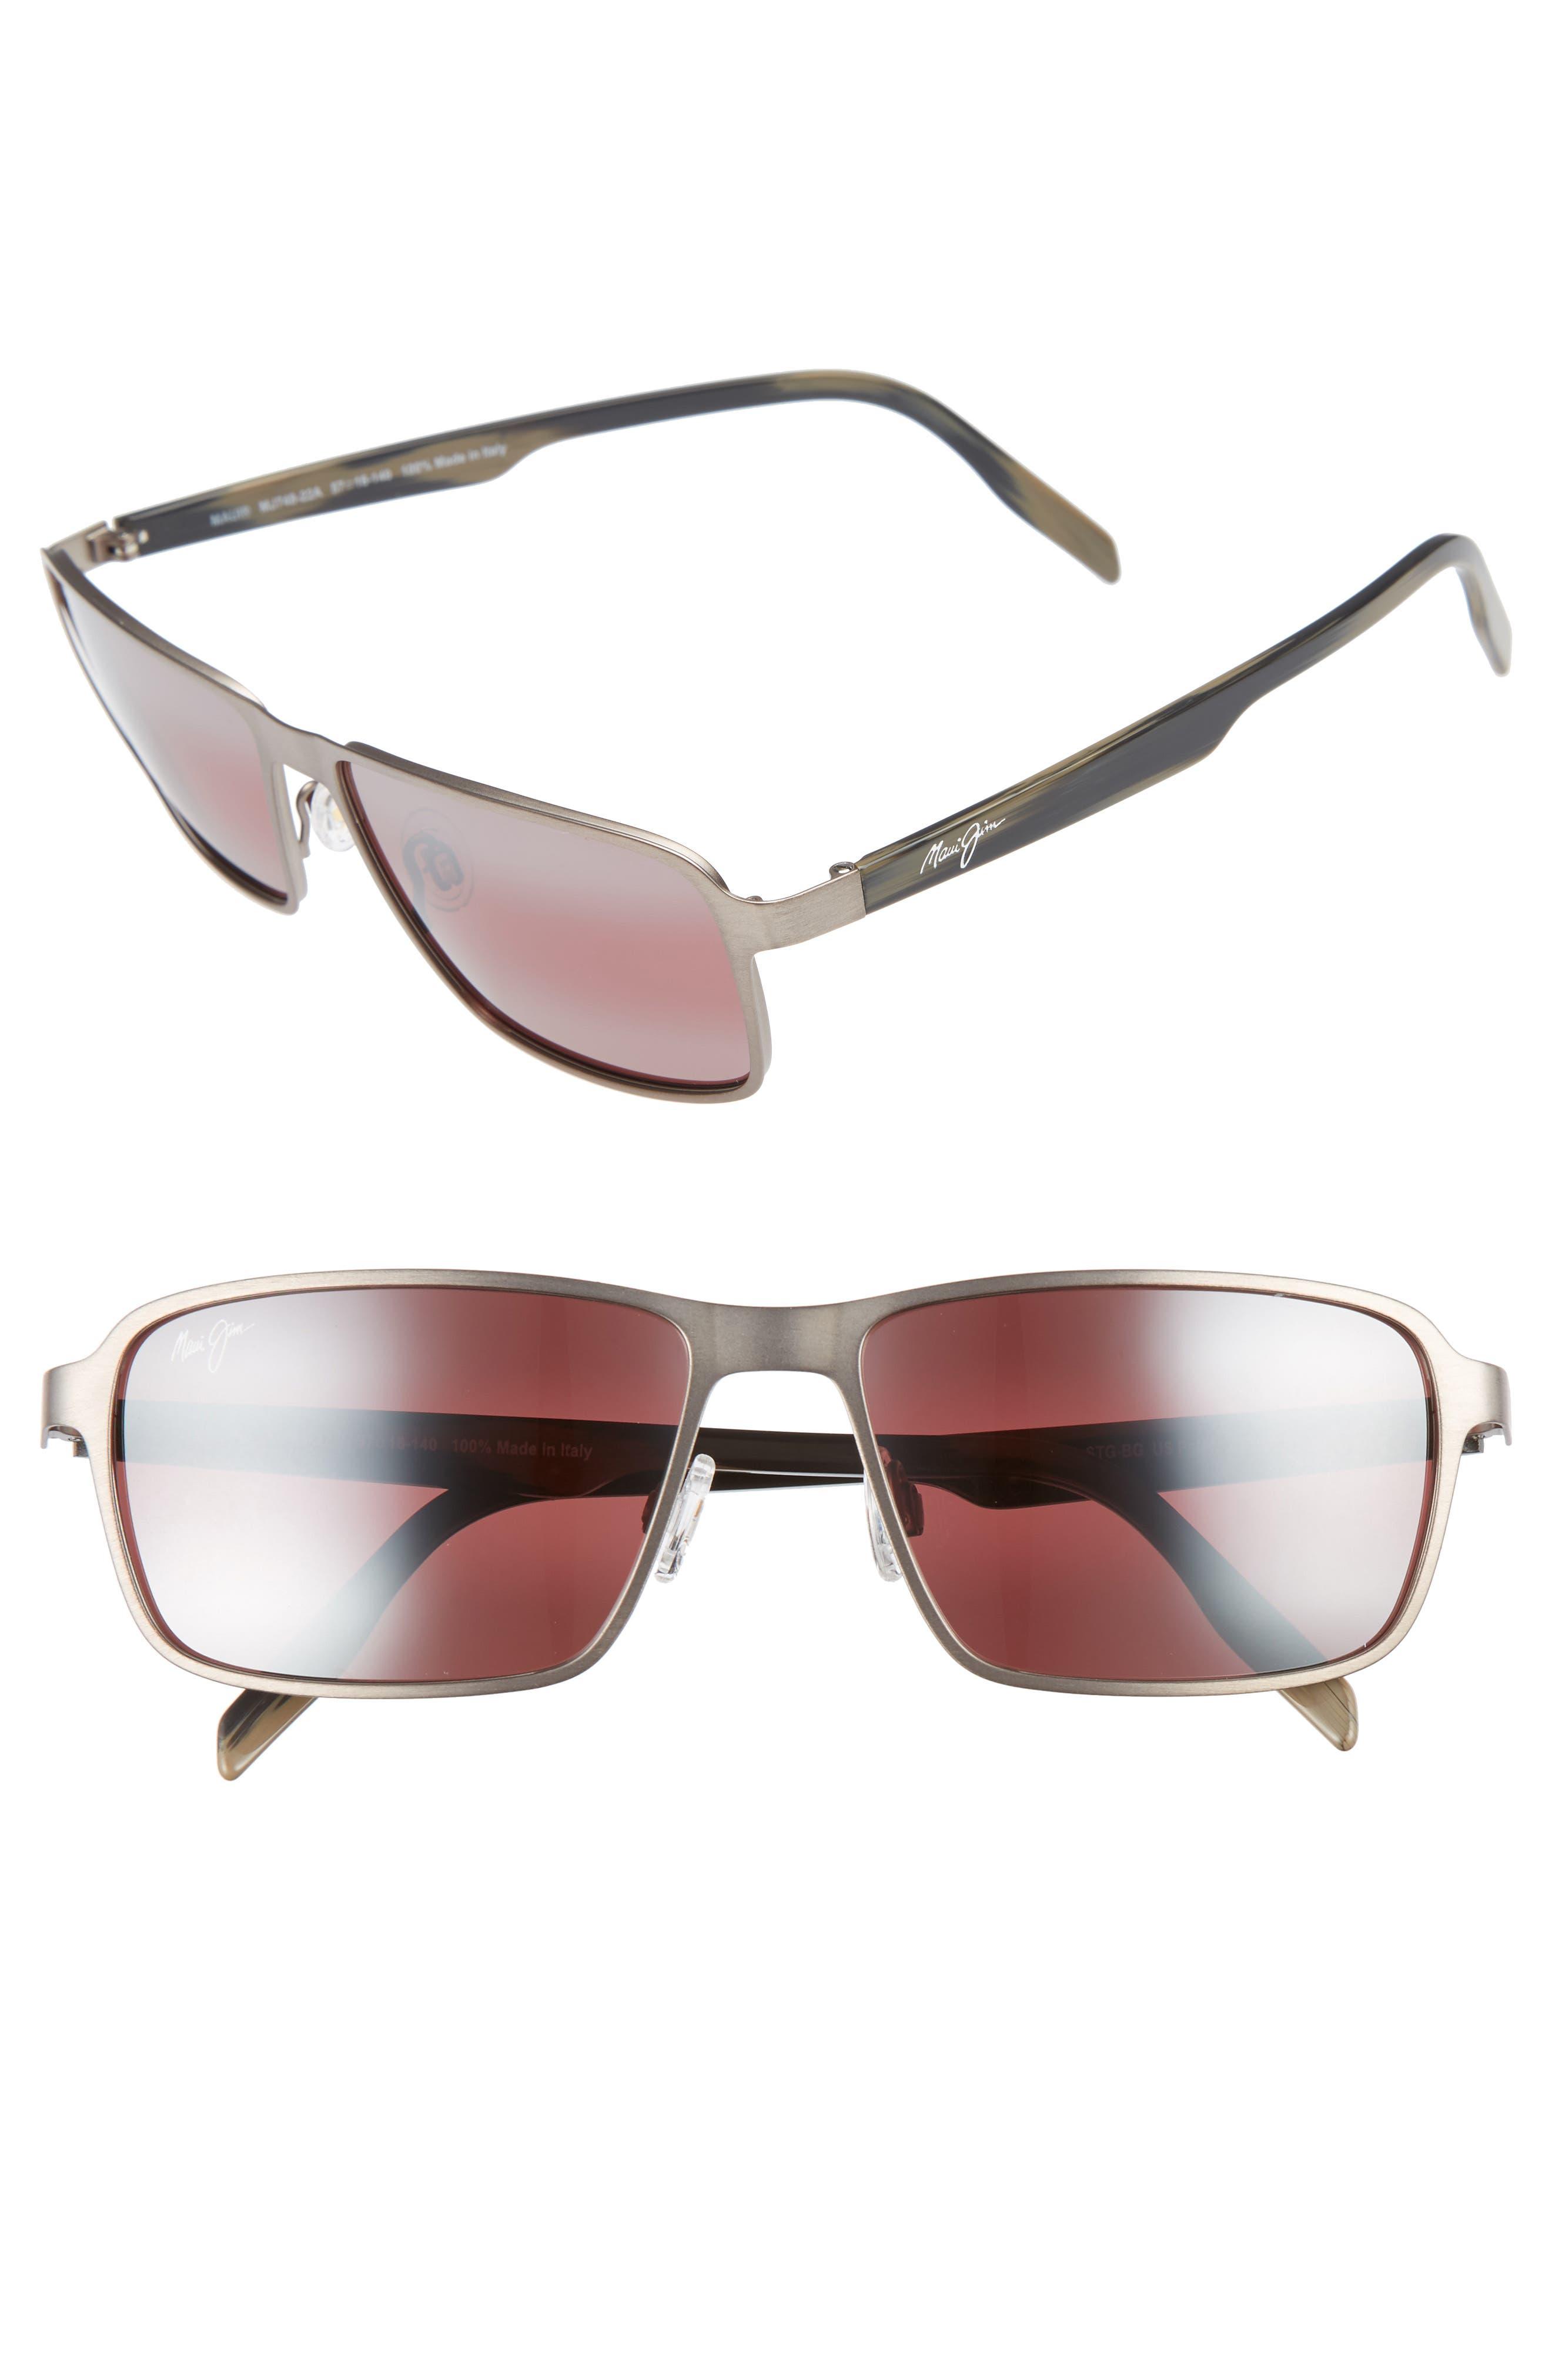 Maui Jim Glass Beach PolarizedPlus®2 54mm Sunglasses